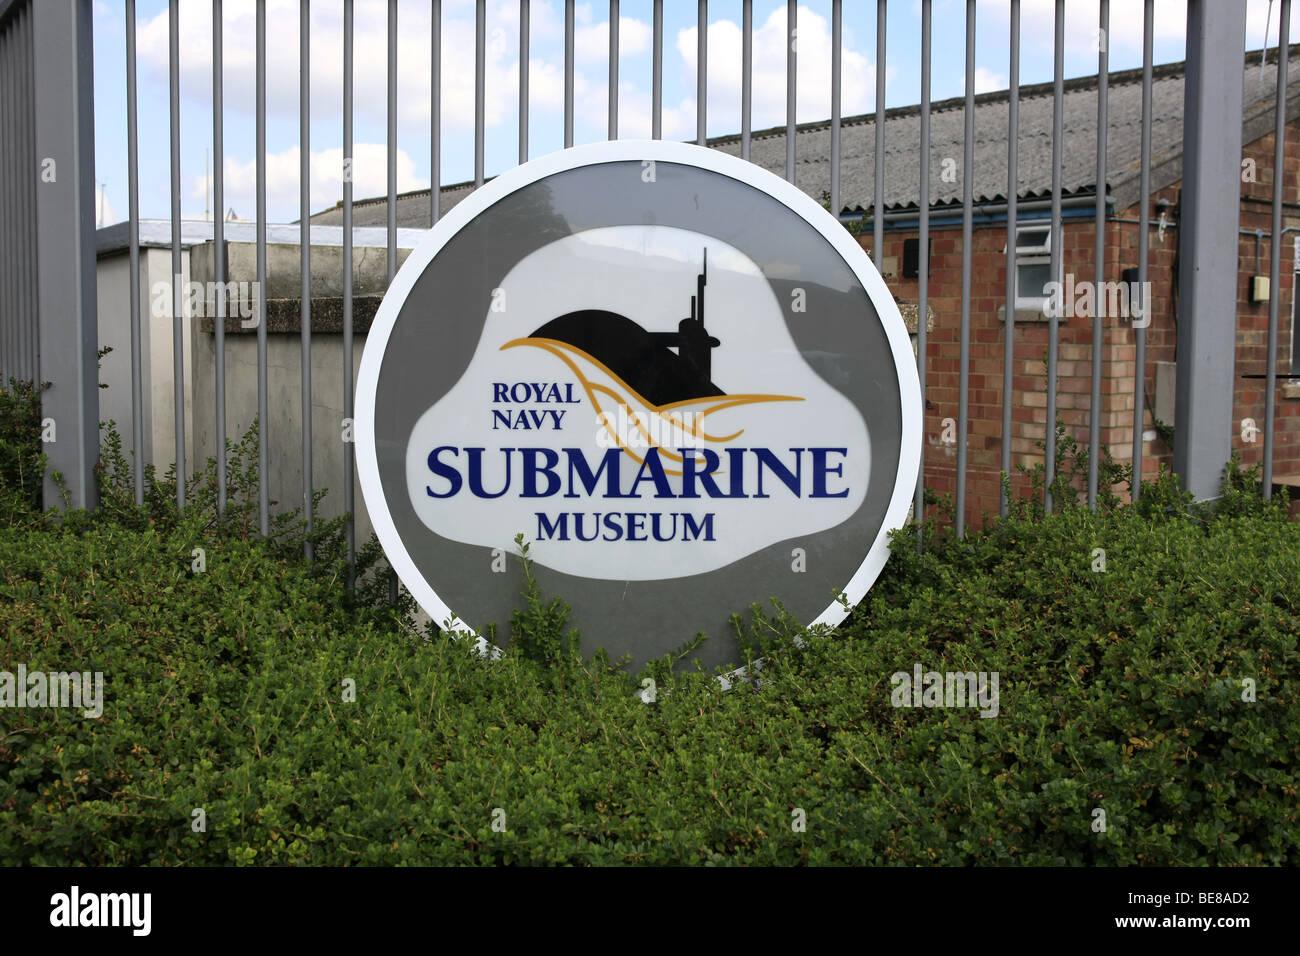 The Gate Logo at the Royal Navy Submarine Museum, Gosport Hampshire England - Stock Image